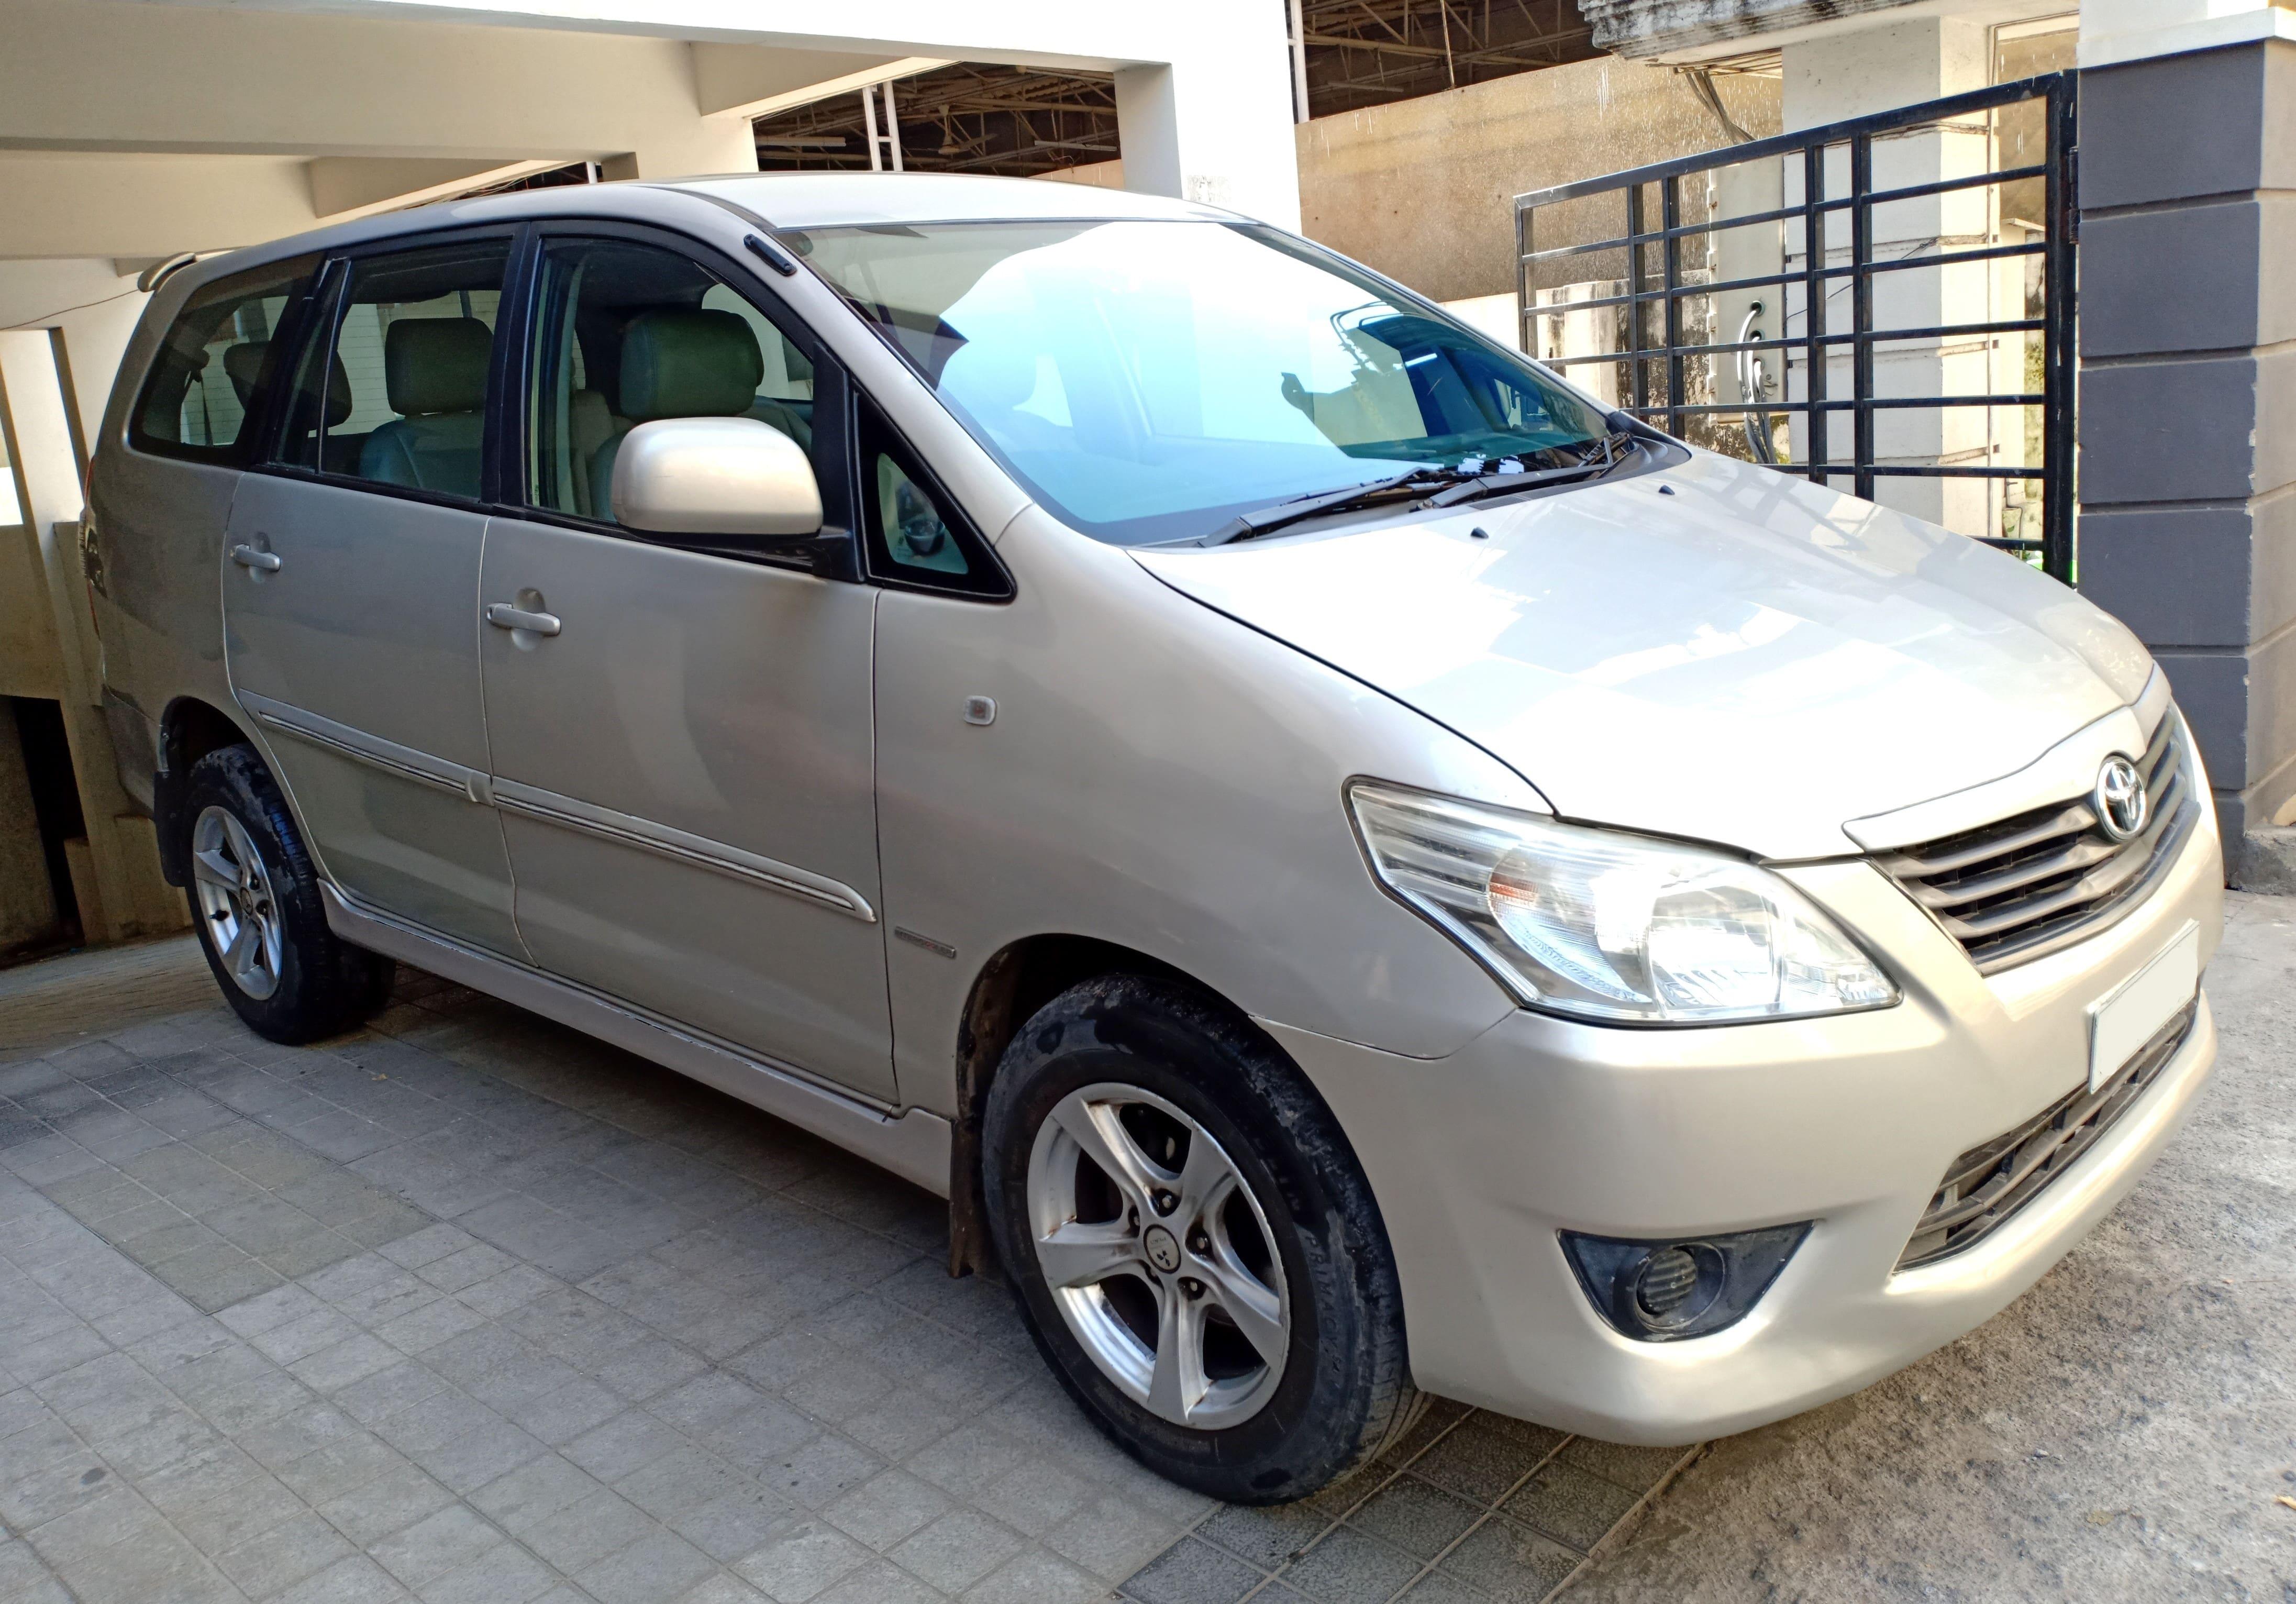 Toyota Innova 2.5 G (Diesel) 7 Seater